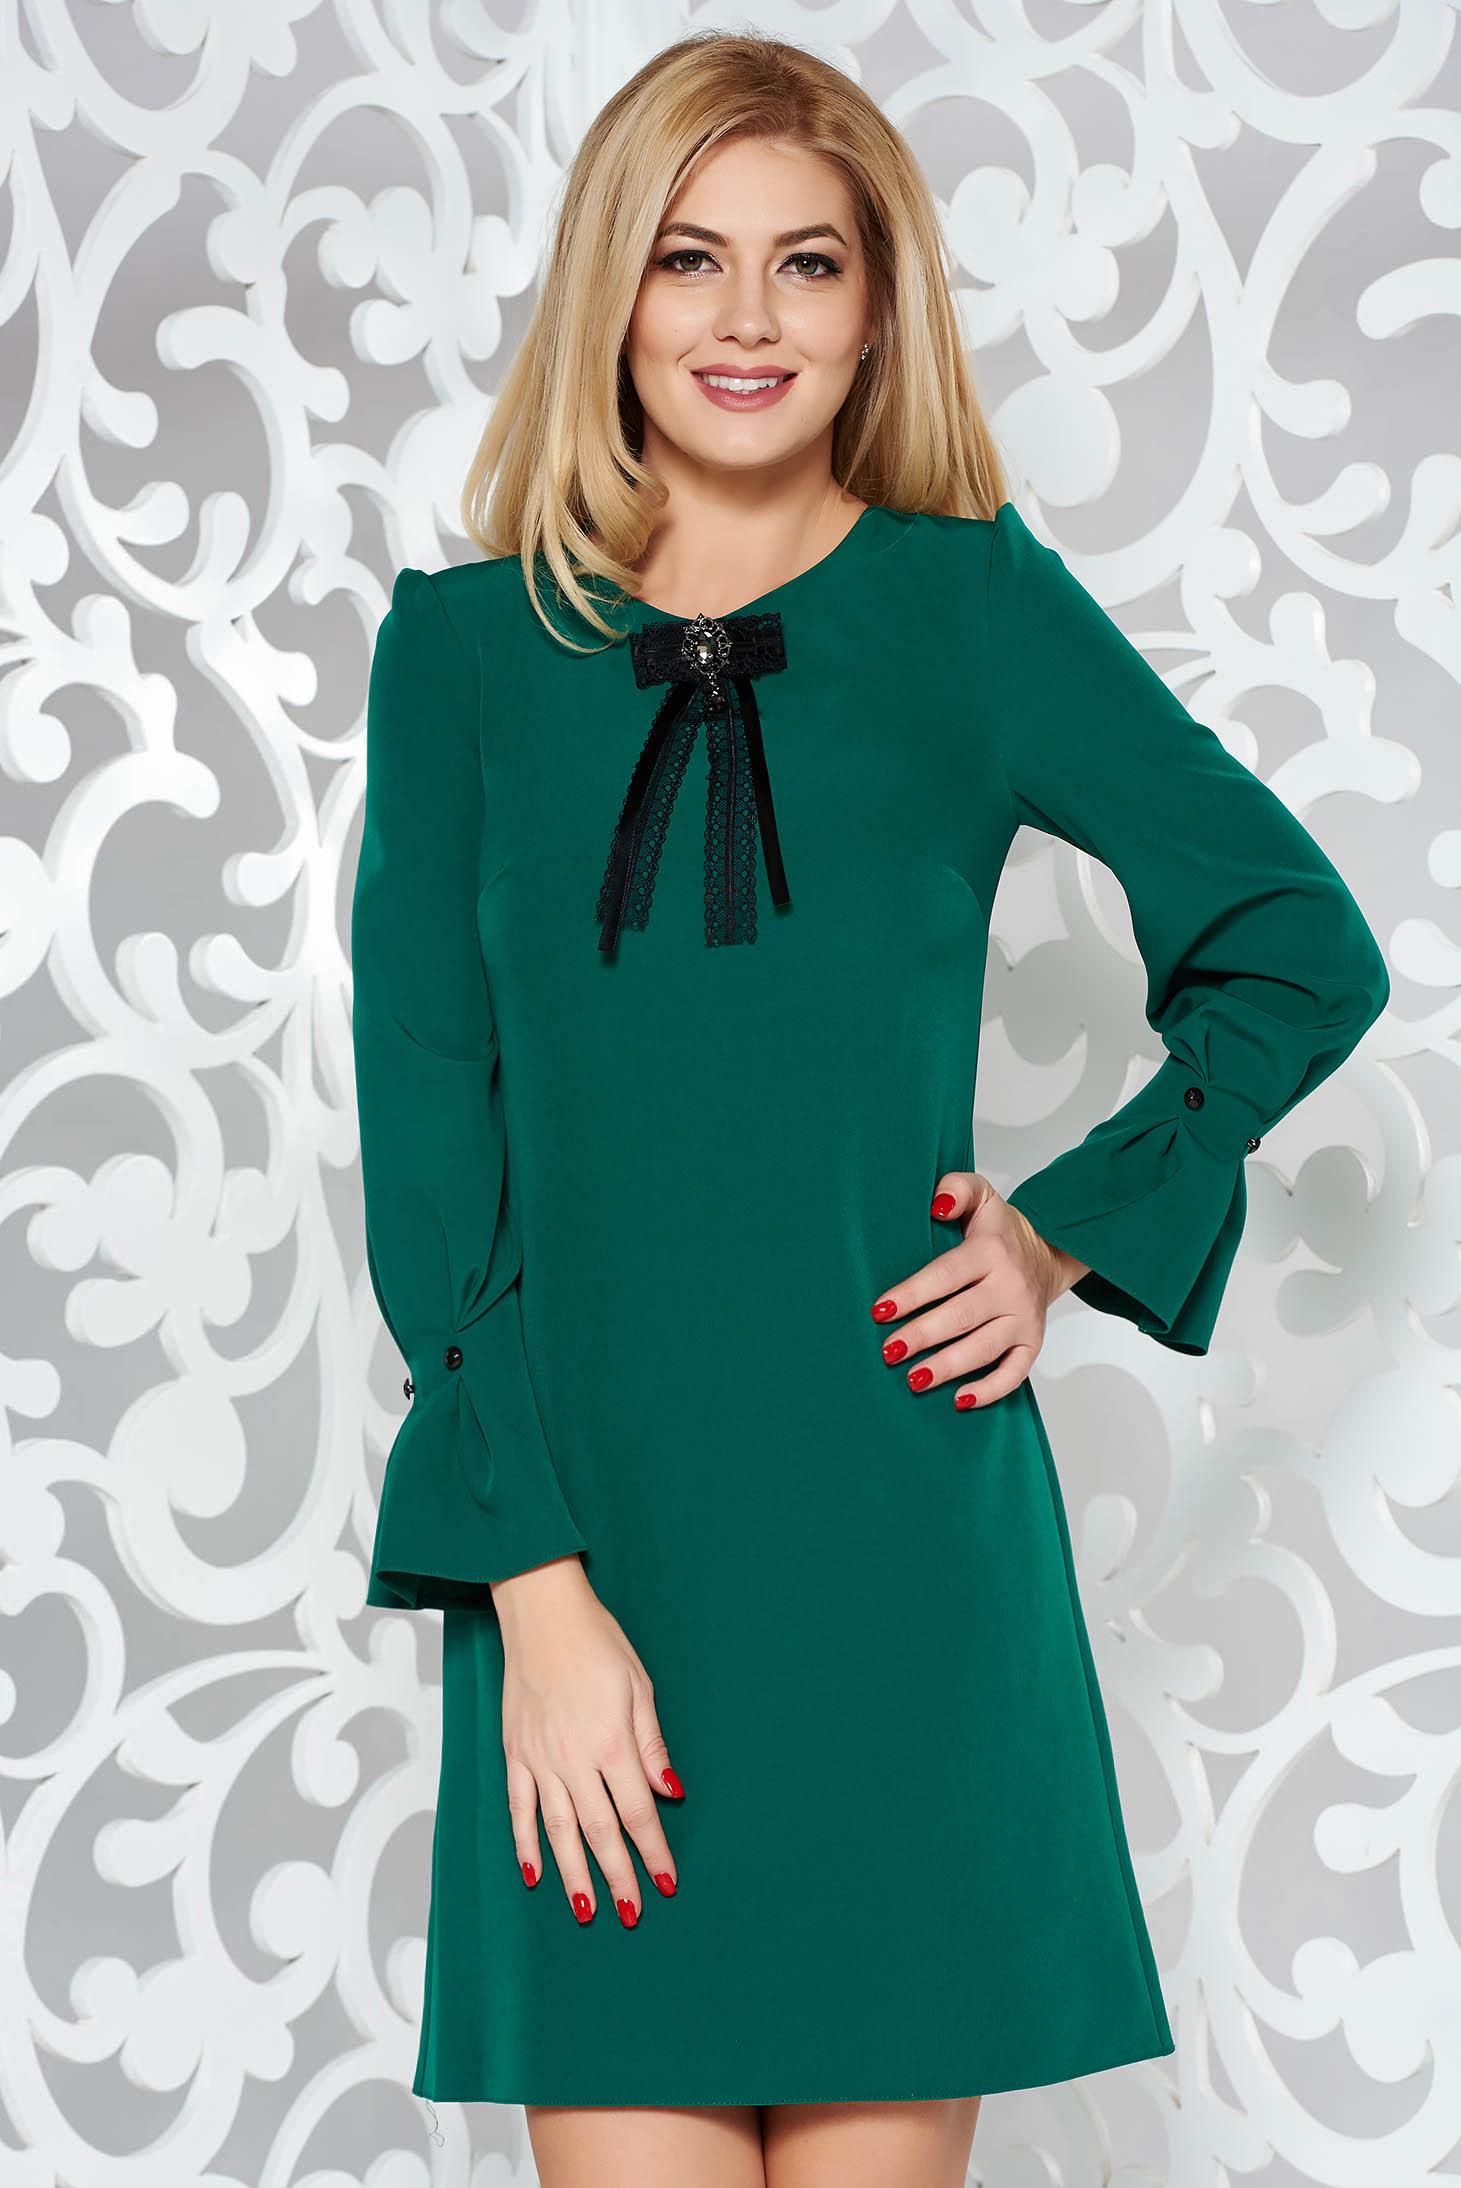 Rochie verde eleganta cu croi larg din stofa usor elastica cu maneci trei-sferturi accesorizata cu brosa